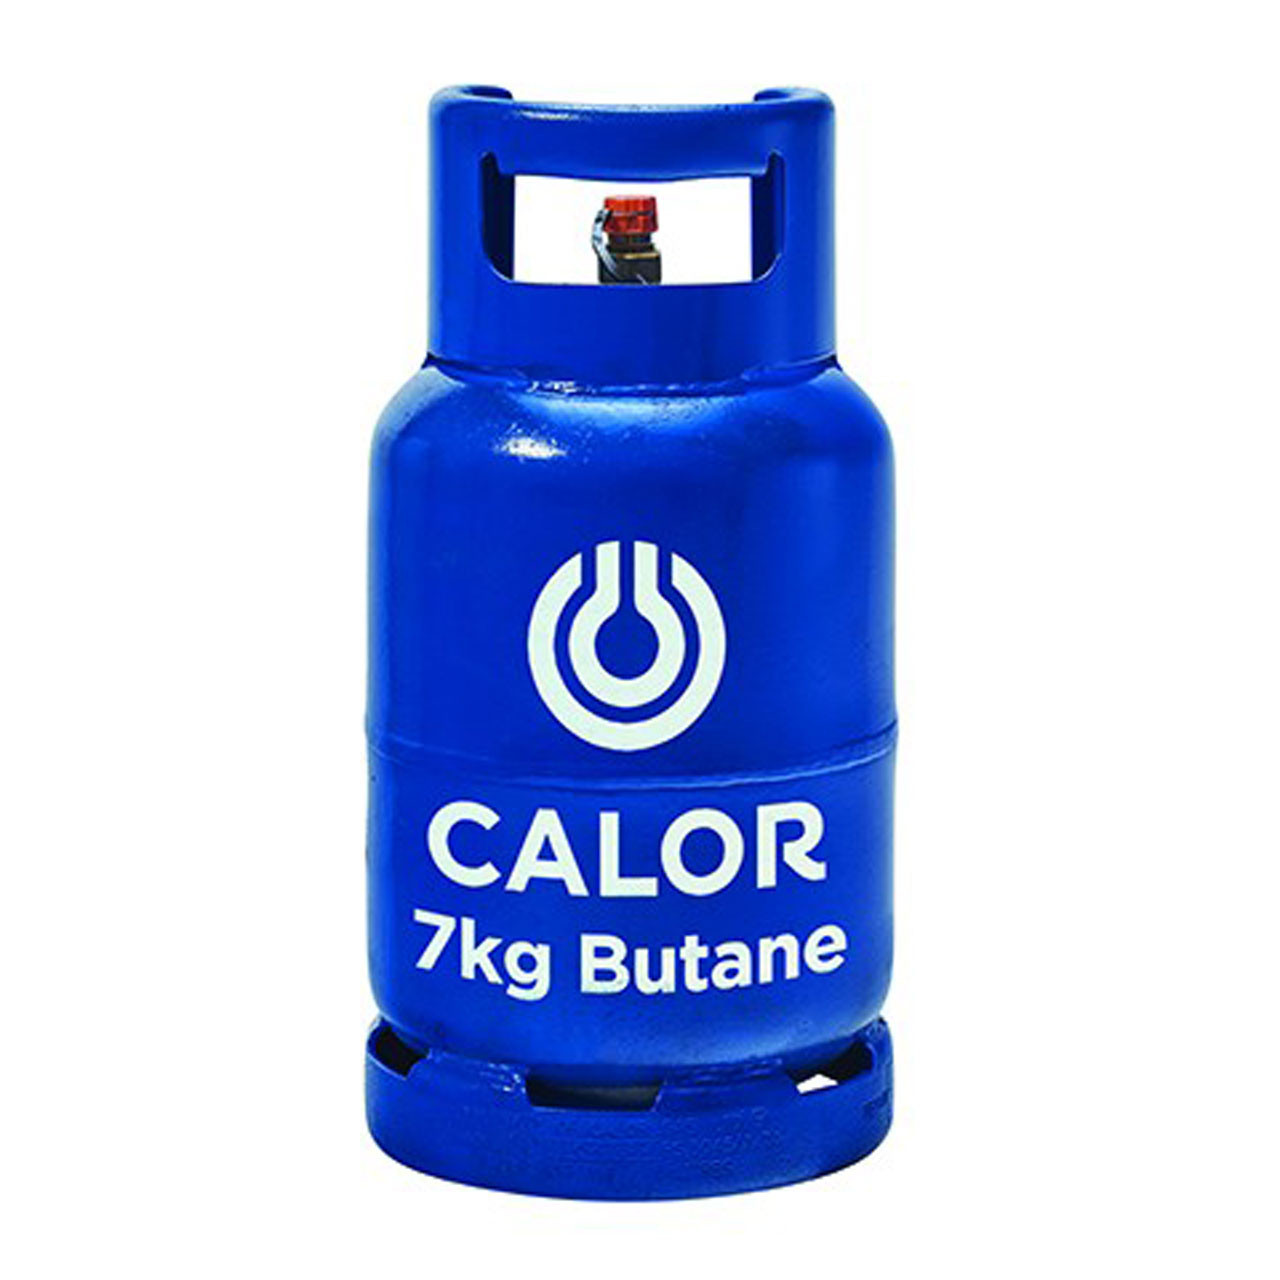 Calor Gas 7kg Butane Refill